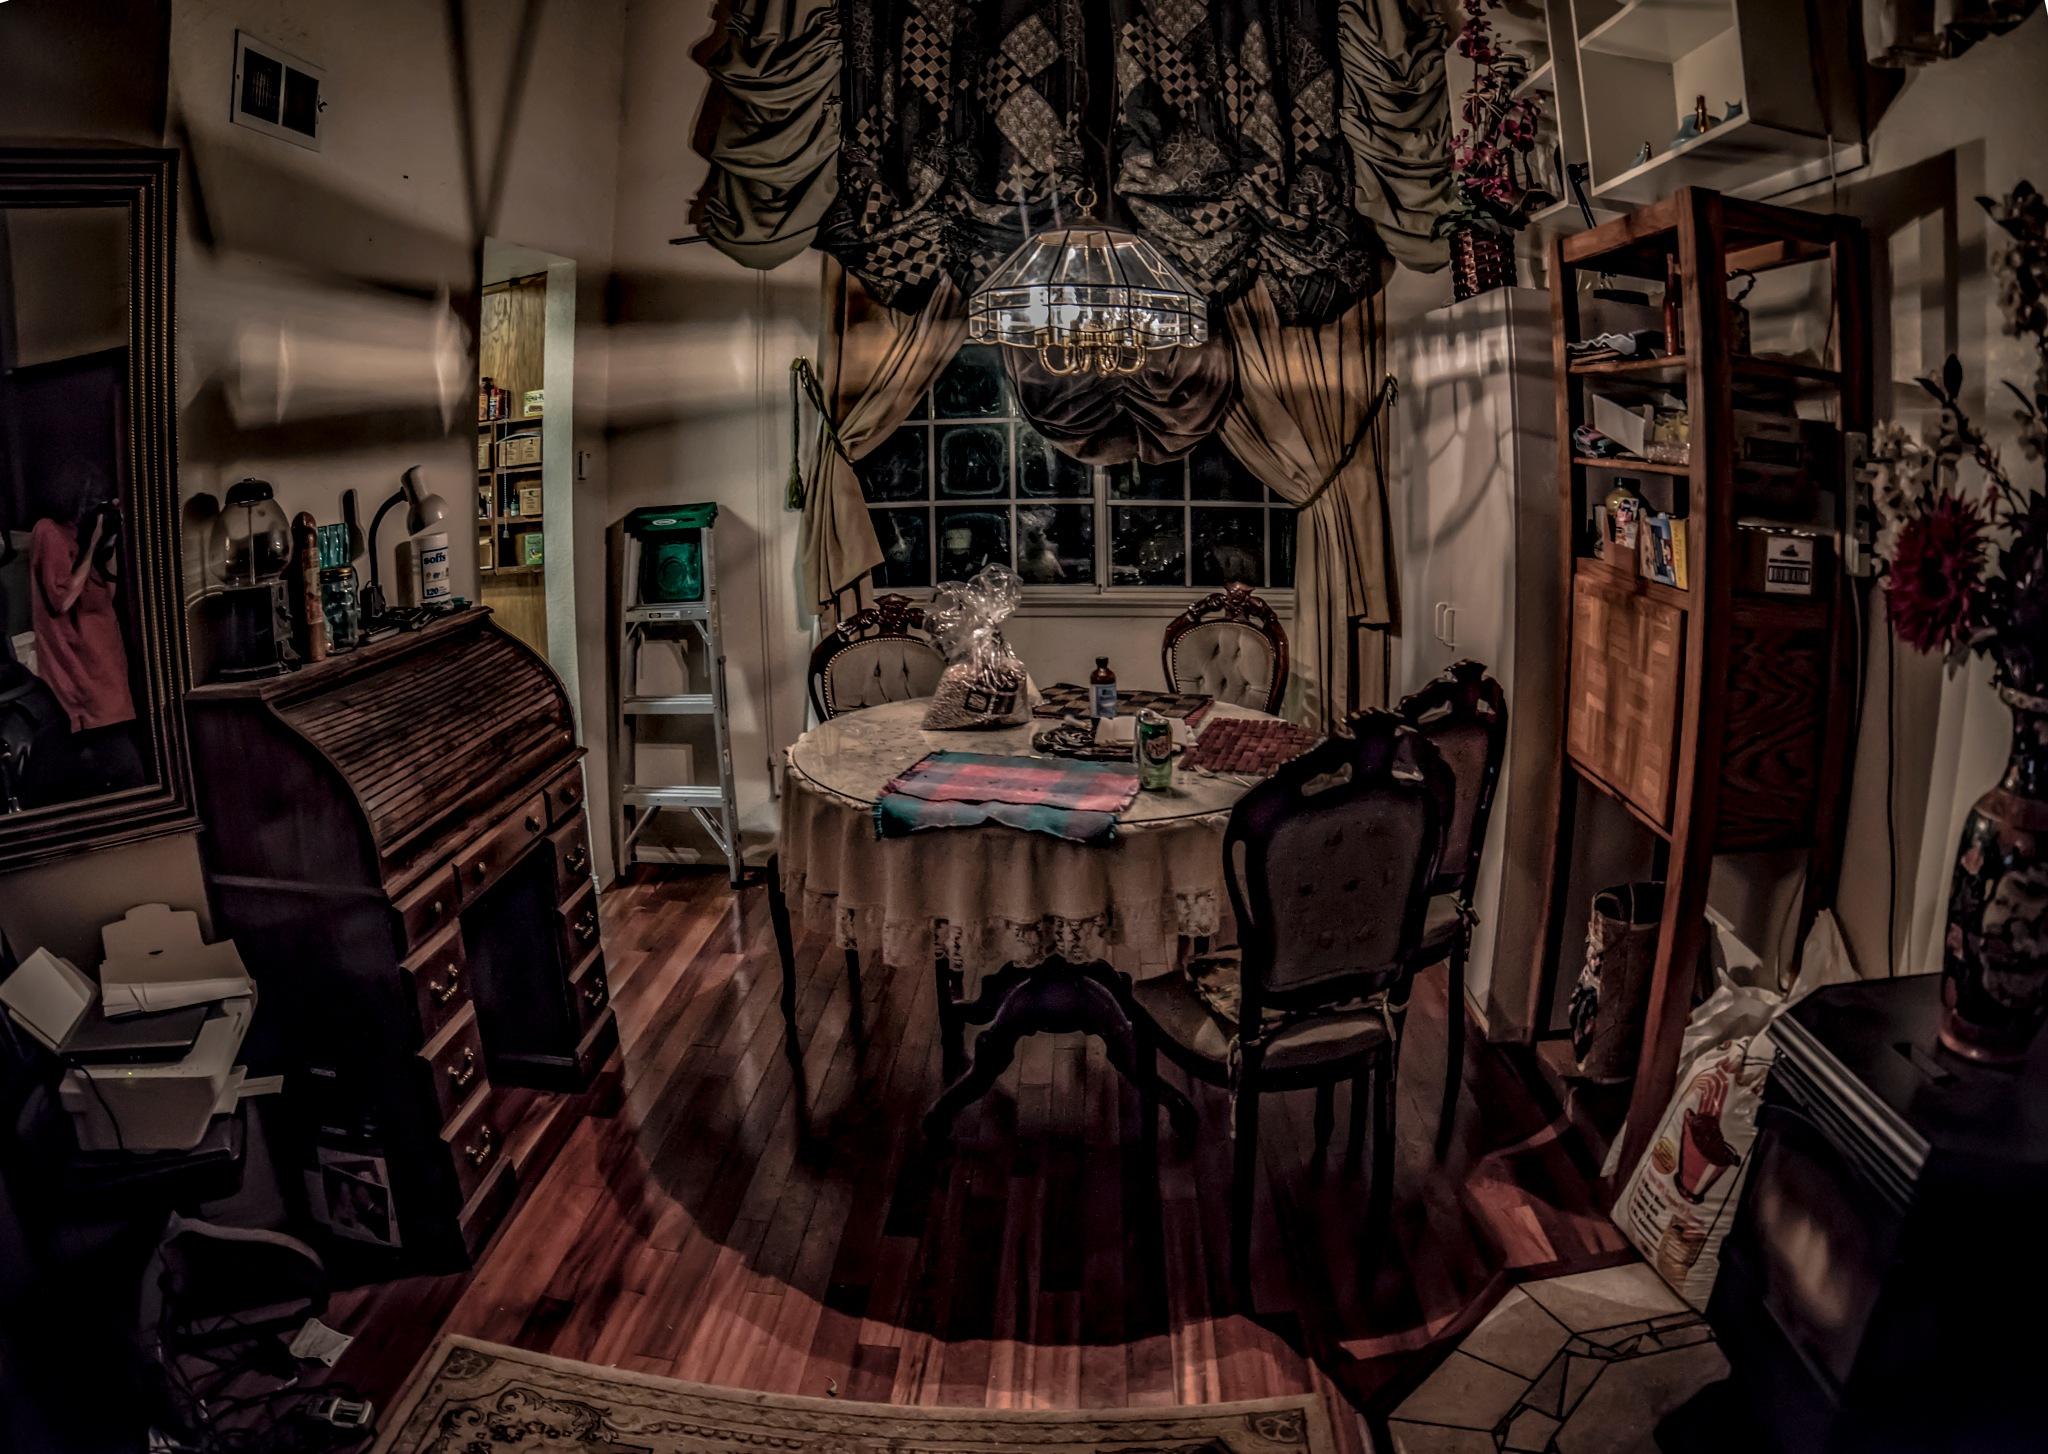 Shoot the Shadows by Cerey Runyon